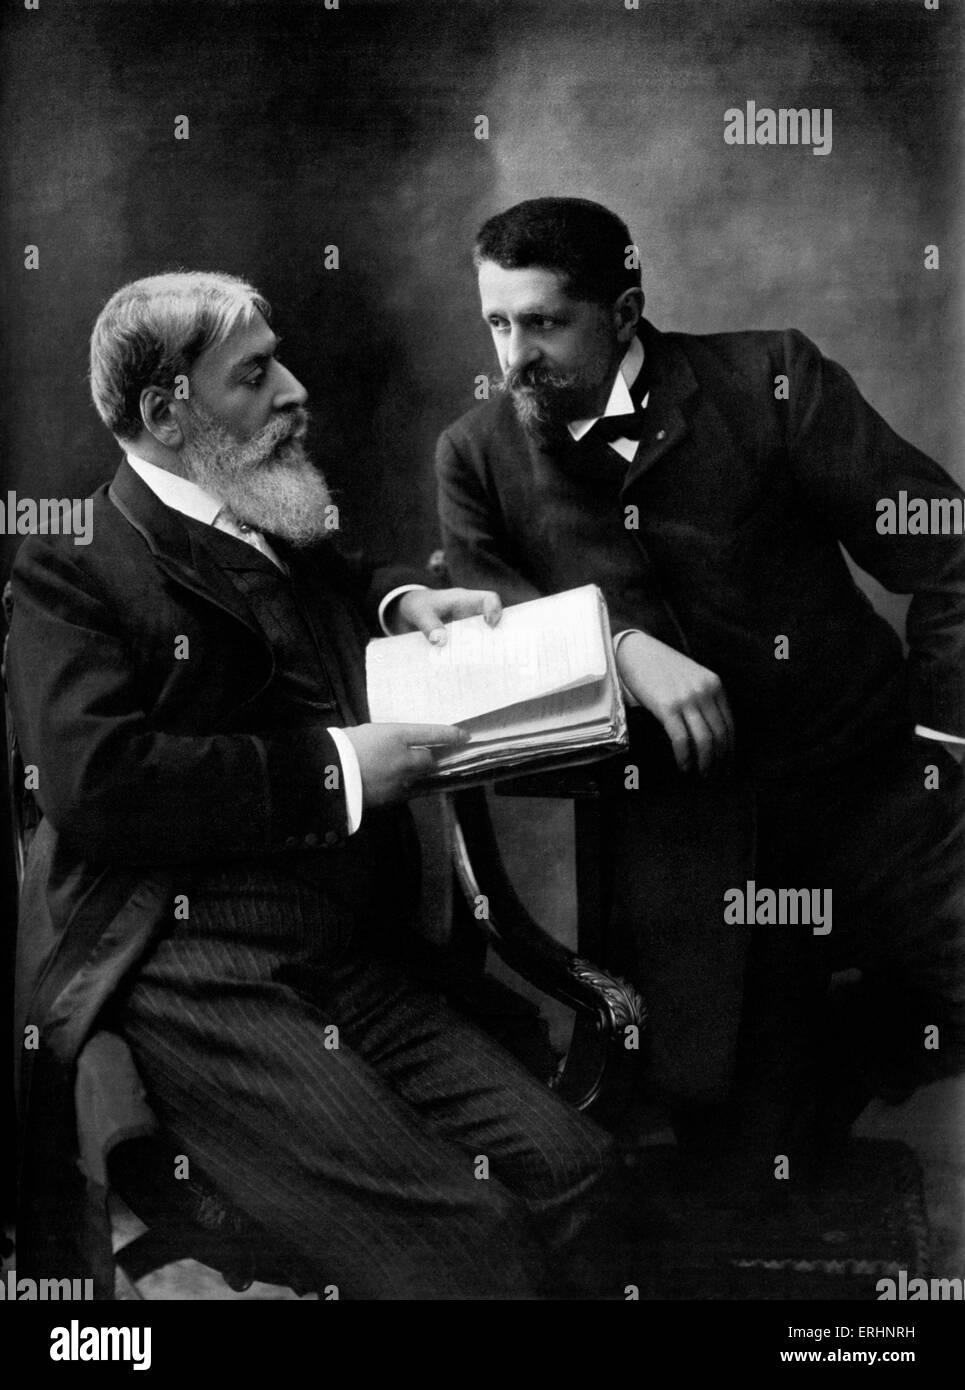 Mounet-Sully and Pierre Barbier Collaborators for La Vieillesse de Don Juan - written in verse, performed1906.(Jean) - Stock Image